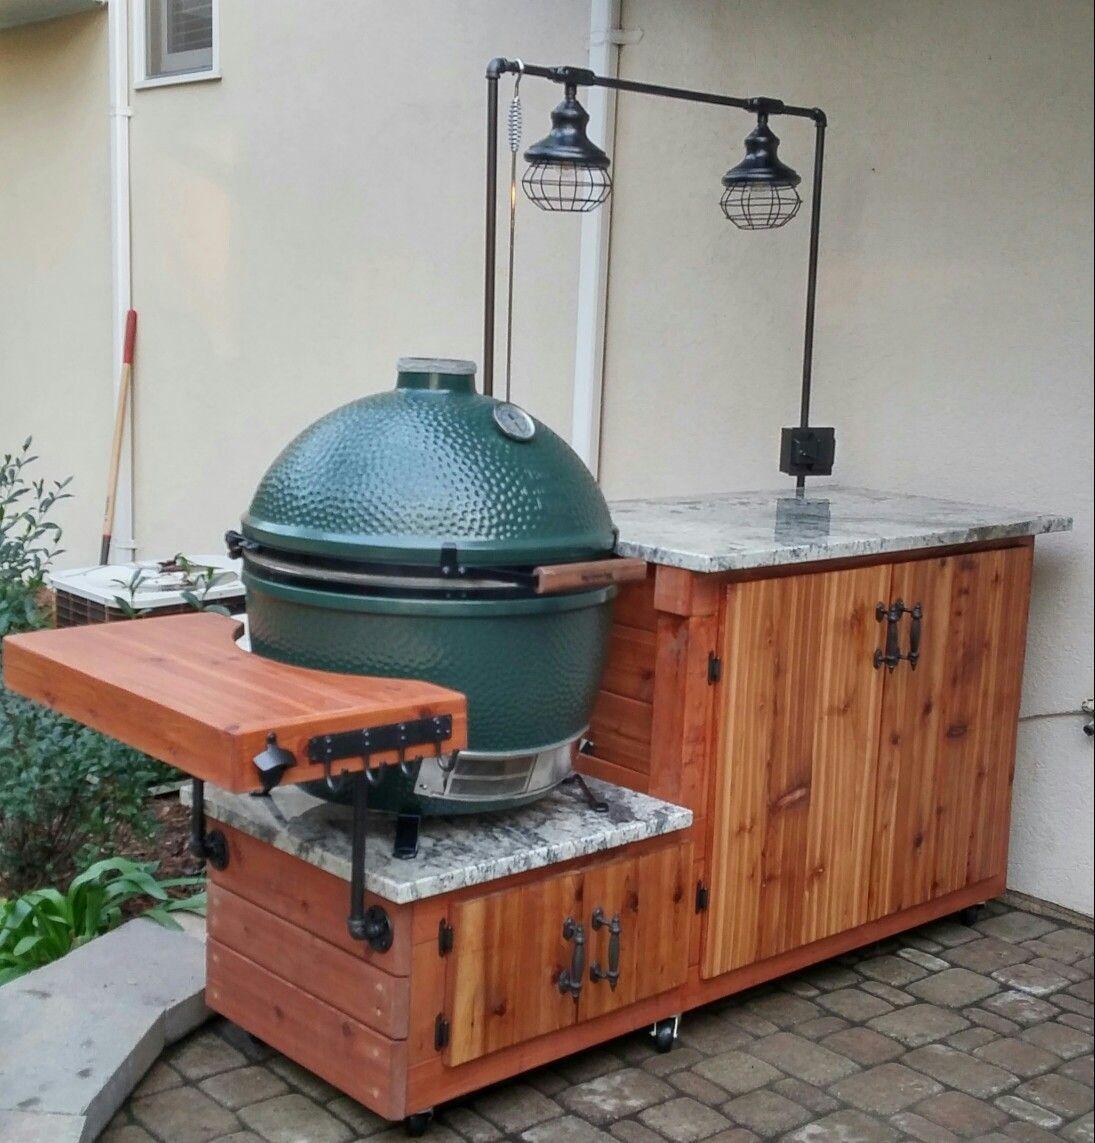 C5001184c0deb25424ed57c7b39e16a5 Jpg 1 095 1 143 Pixels Big Green Egg Outdoor Kitchen Bbq Grill Design Big Green Egg Table